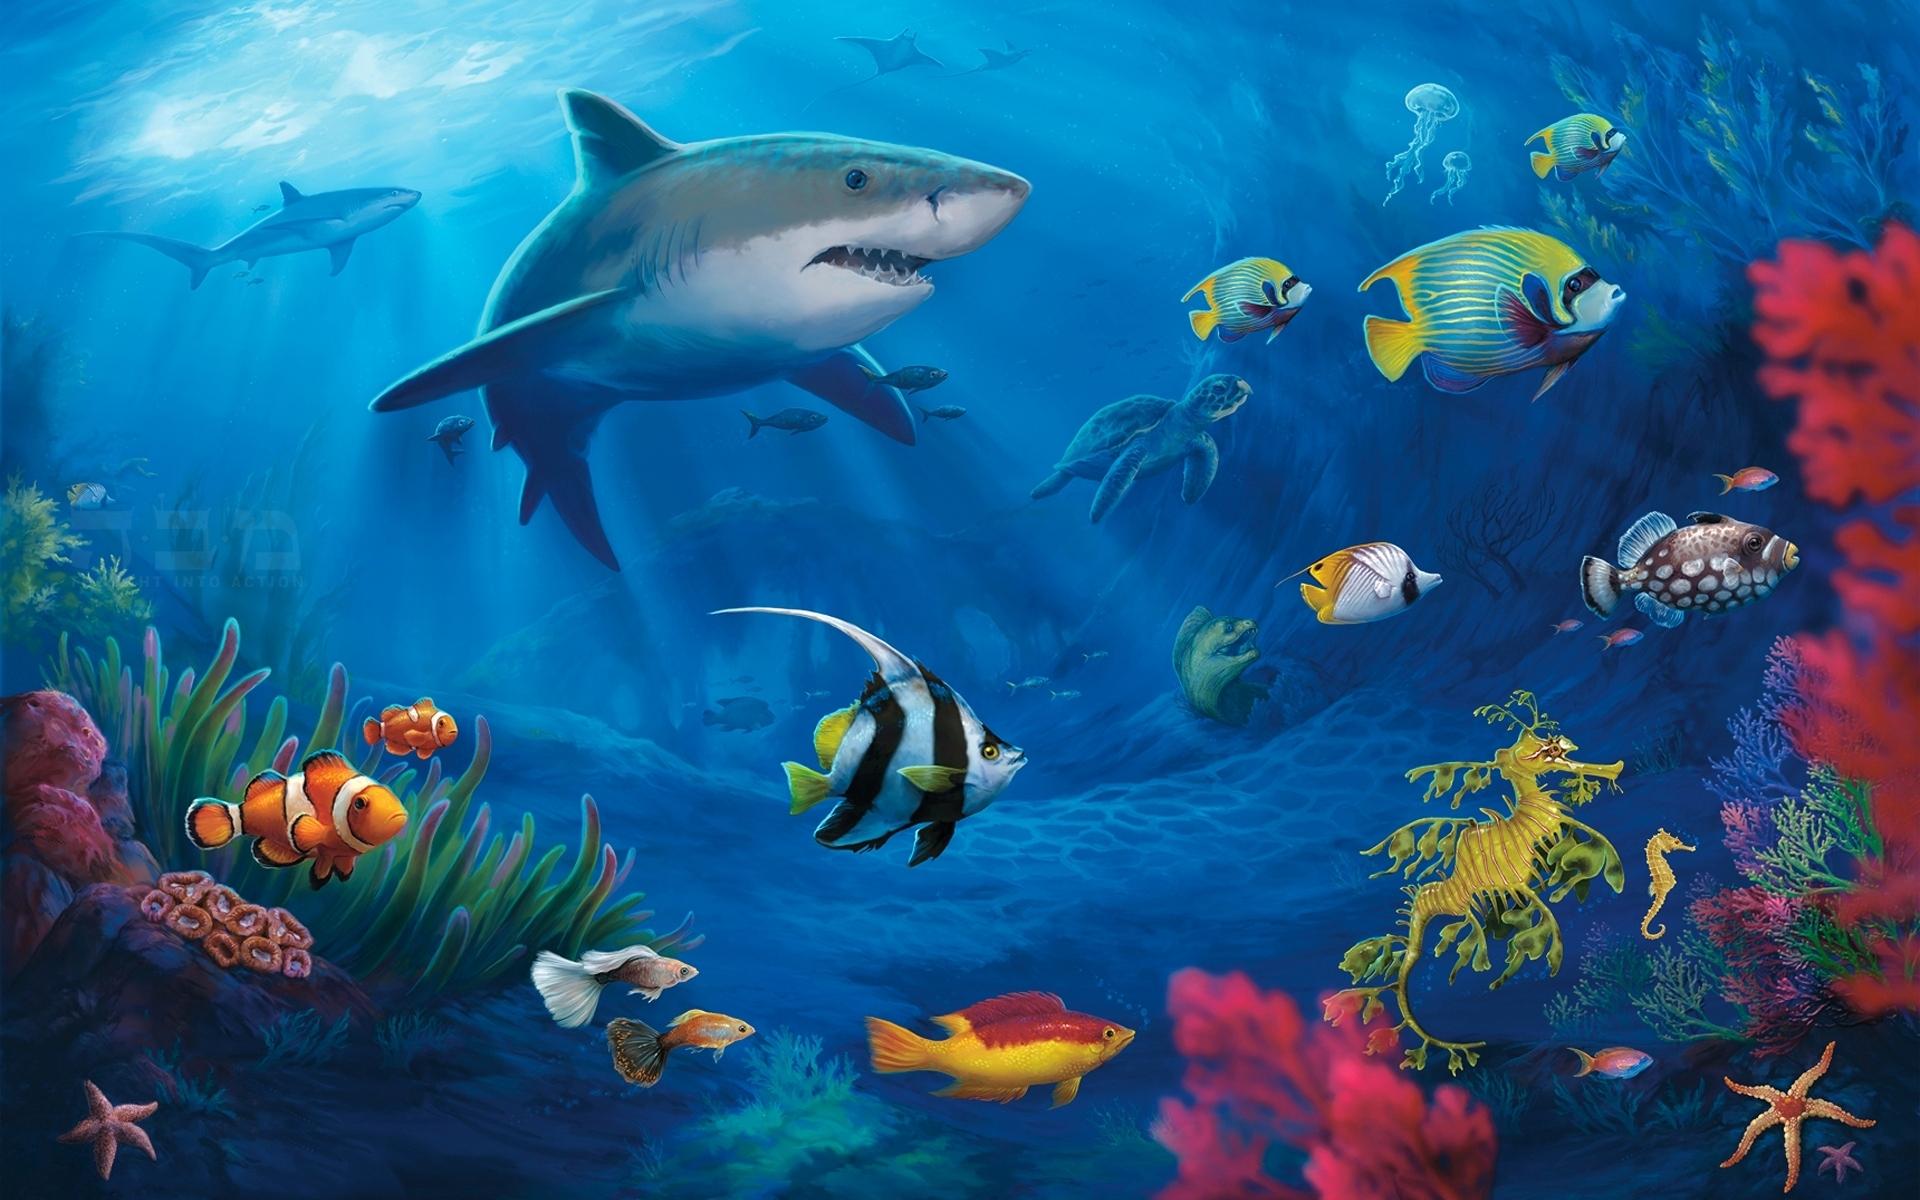 Wallpapers Fantasy Fish Wallpaper 1920x1200